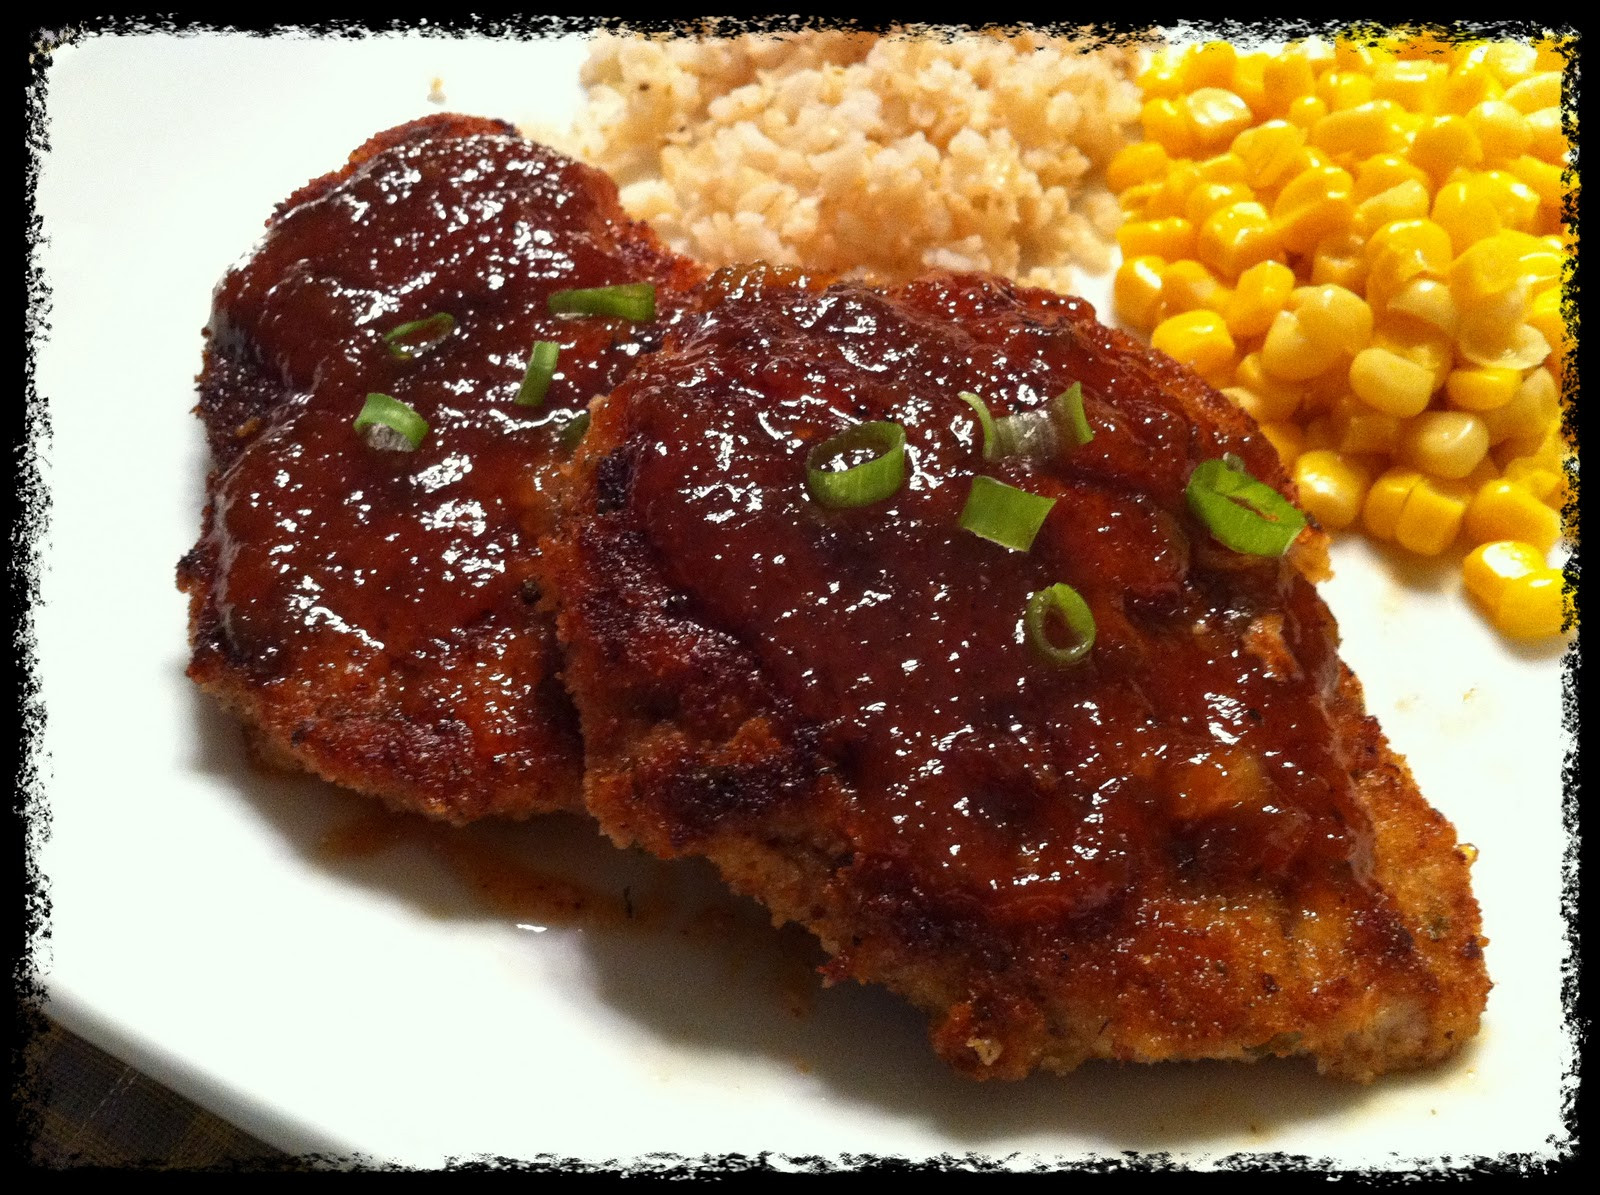 Brown Sugar Glazed Pork Chops  Scrumptious Recreations Brown Sugar Glazed Pork Chops